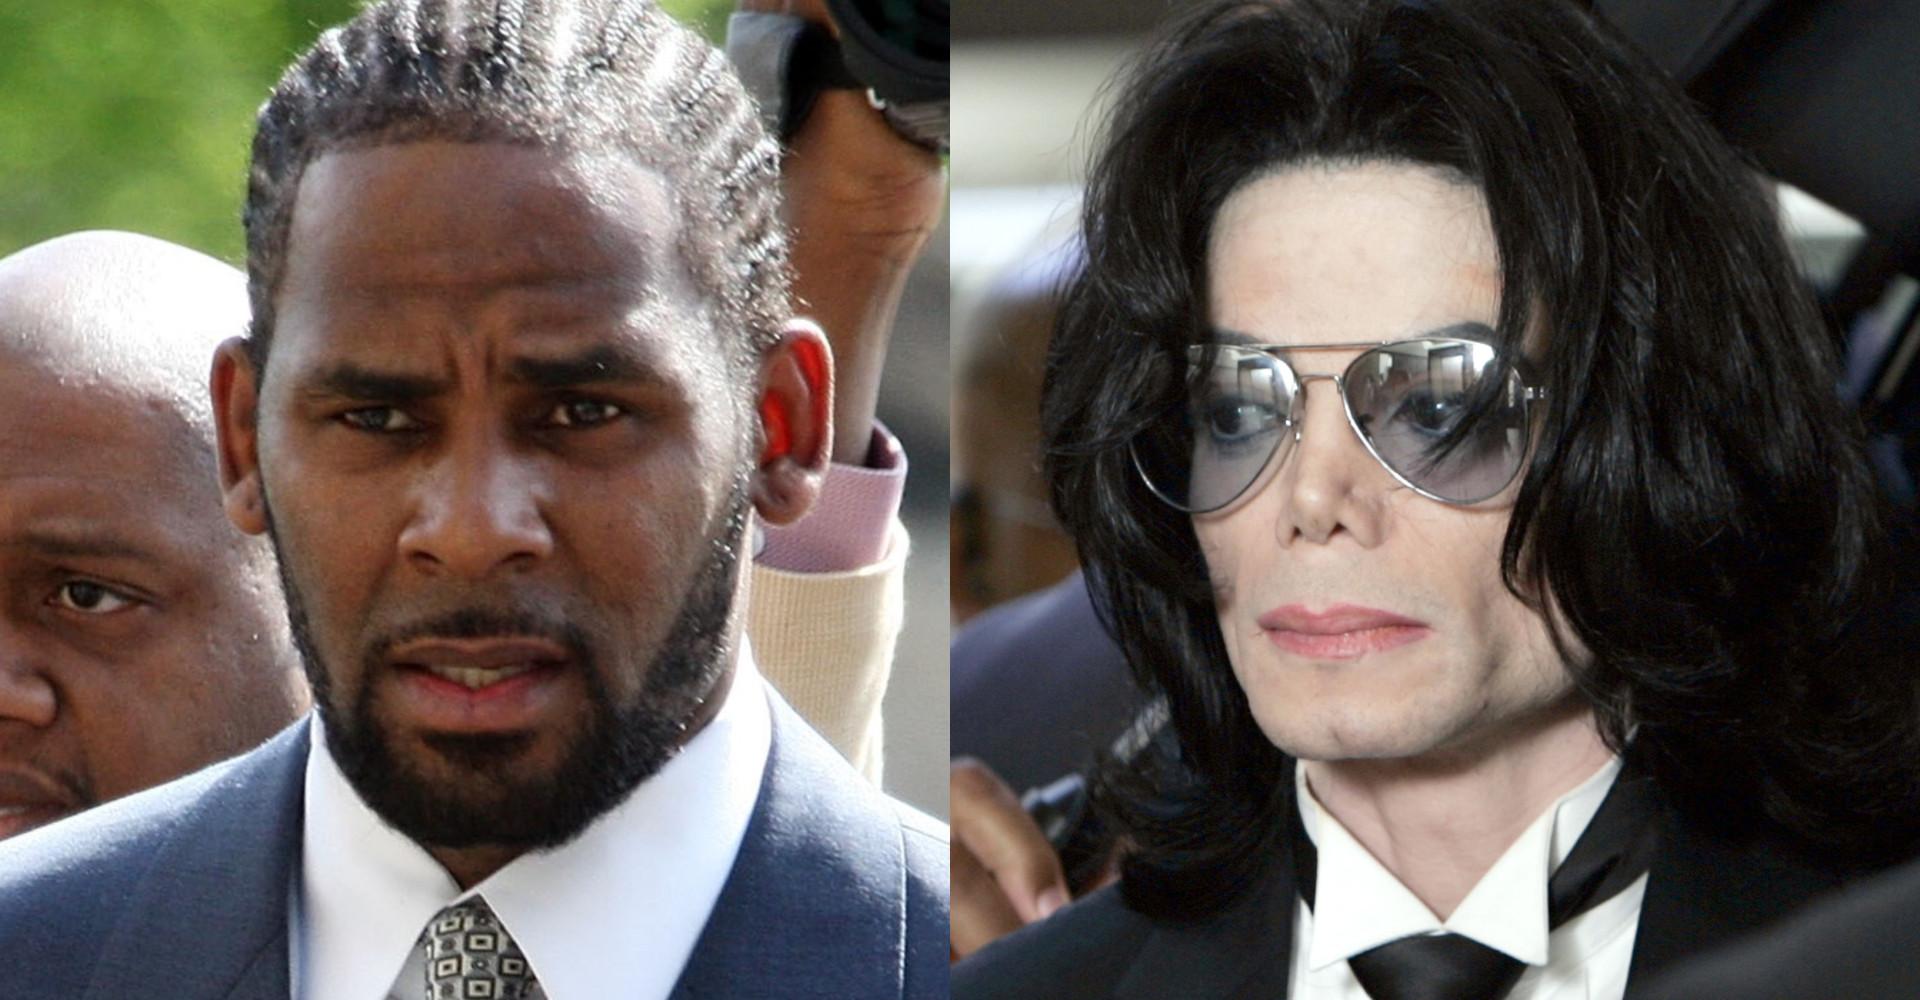 Ne-Yo thinks we should mute R. Kelly, but not Michael Jackson